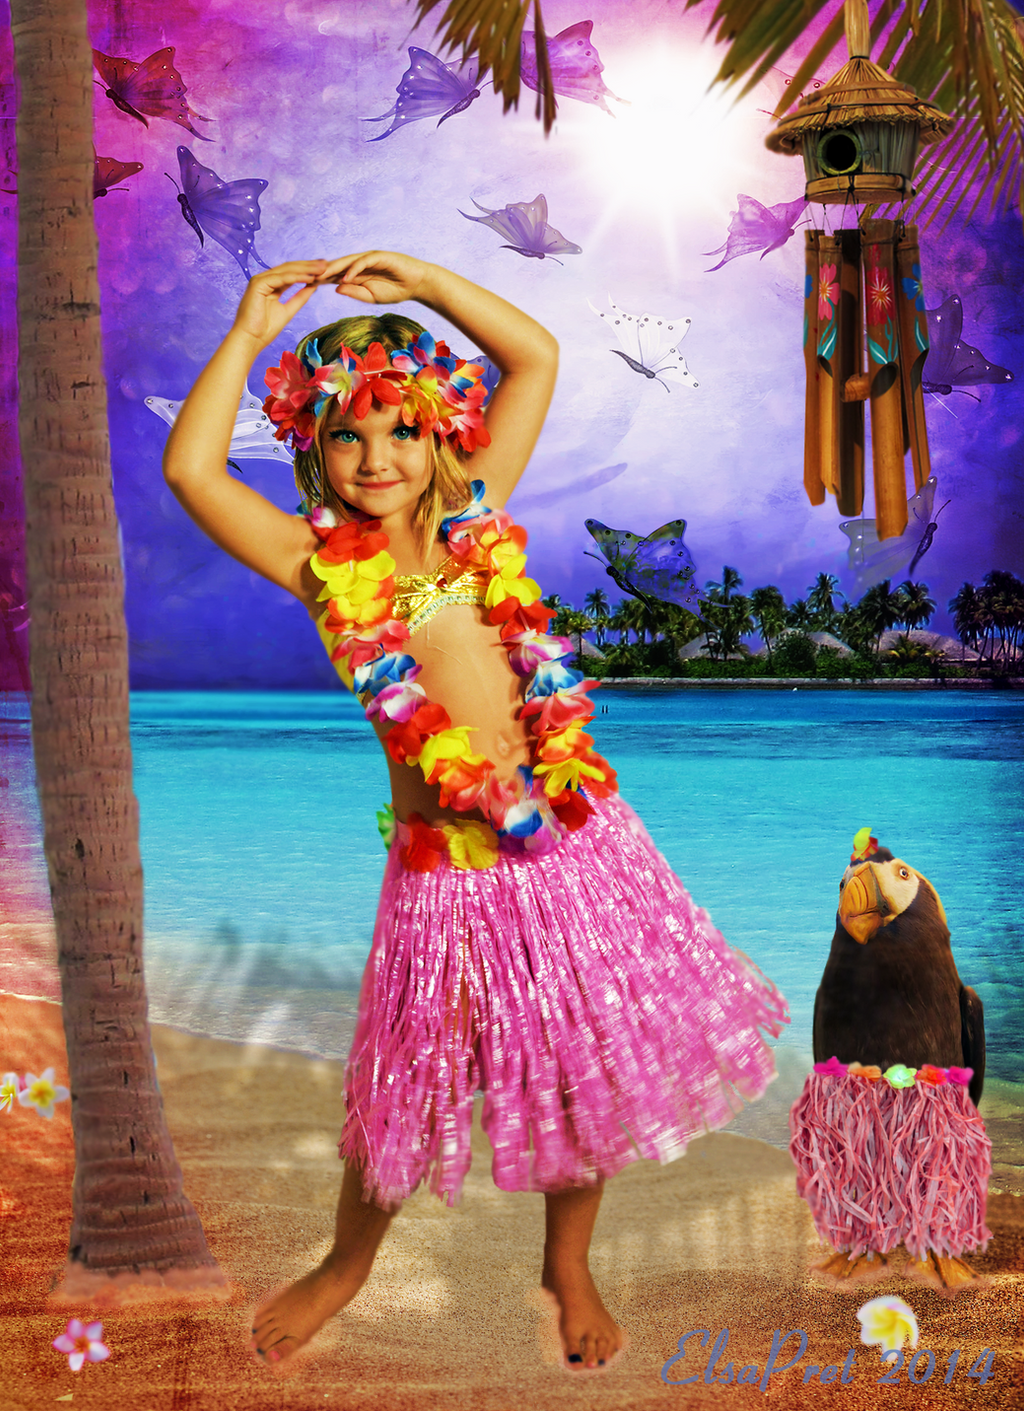 Lesson in Hula Dancing by Elsapret